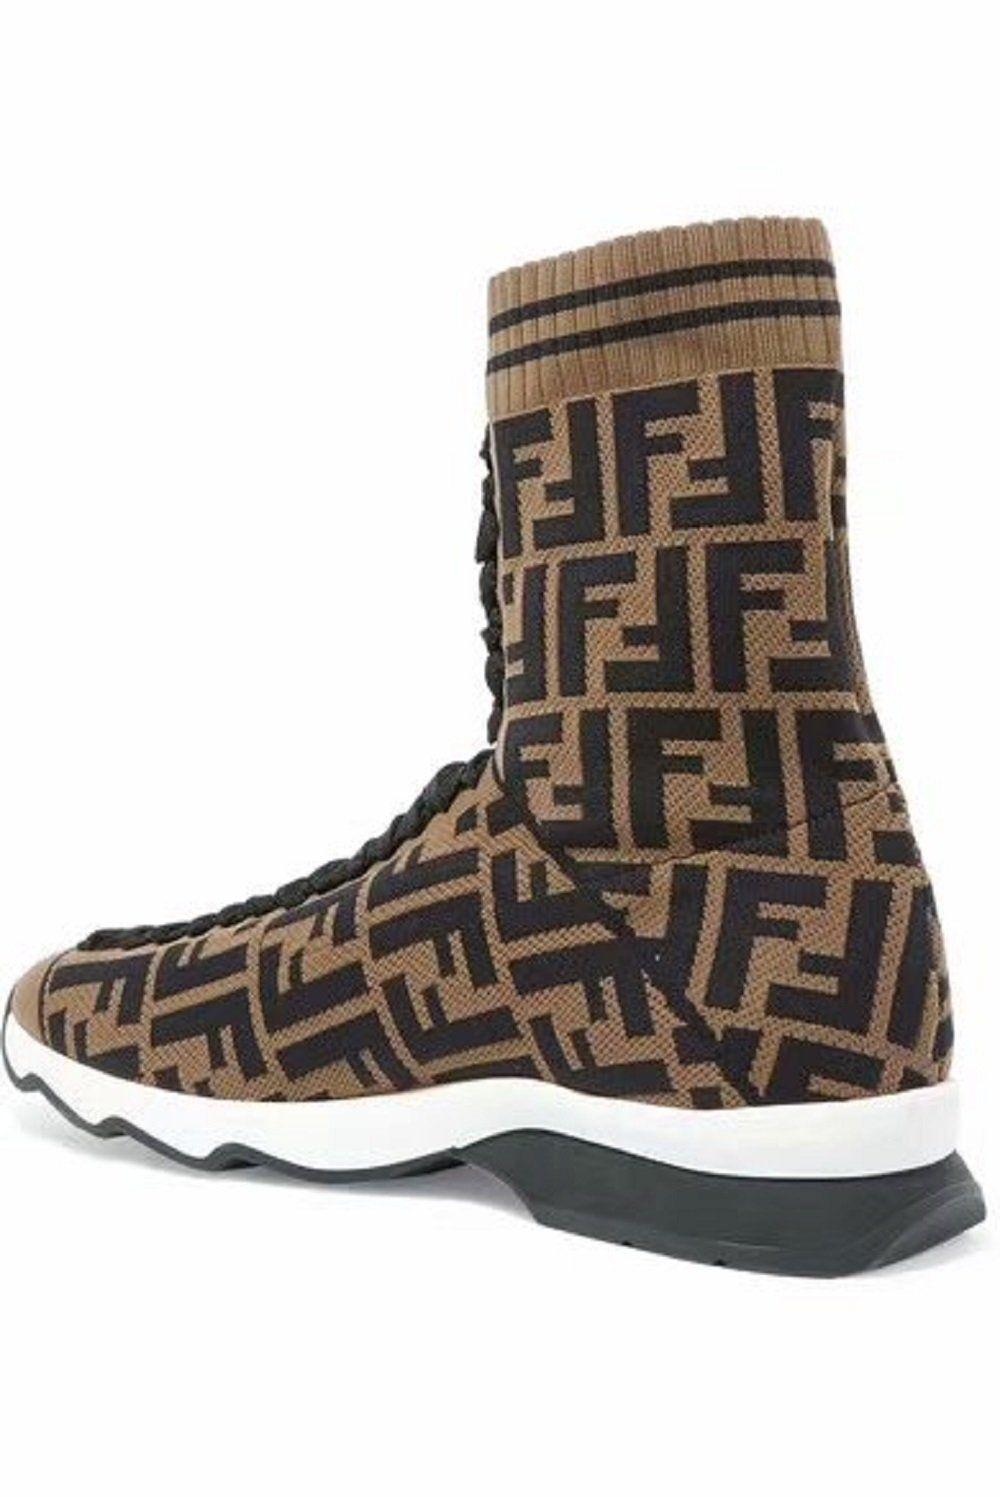 3a20a74637bb Fendi.. Women s Leather High-Top Sock Sneaker Shoes (41EU ...